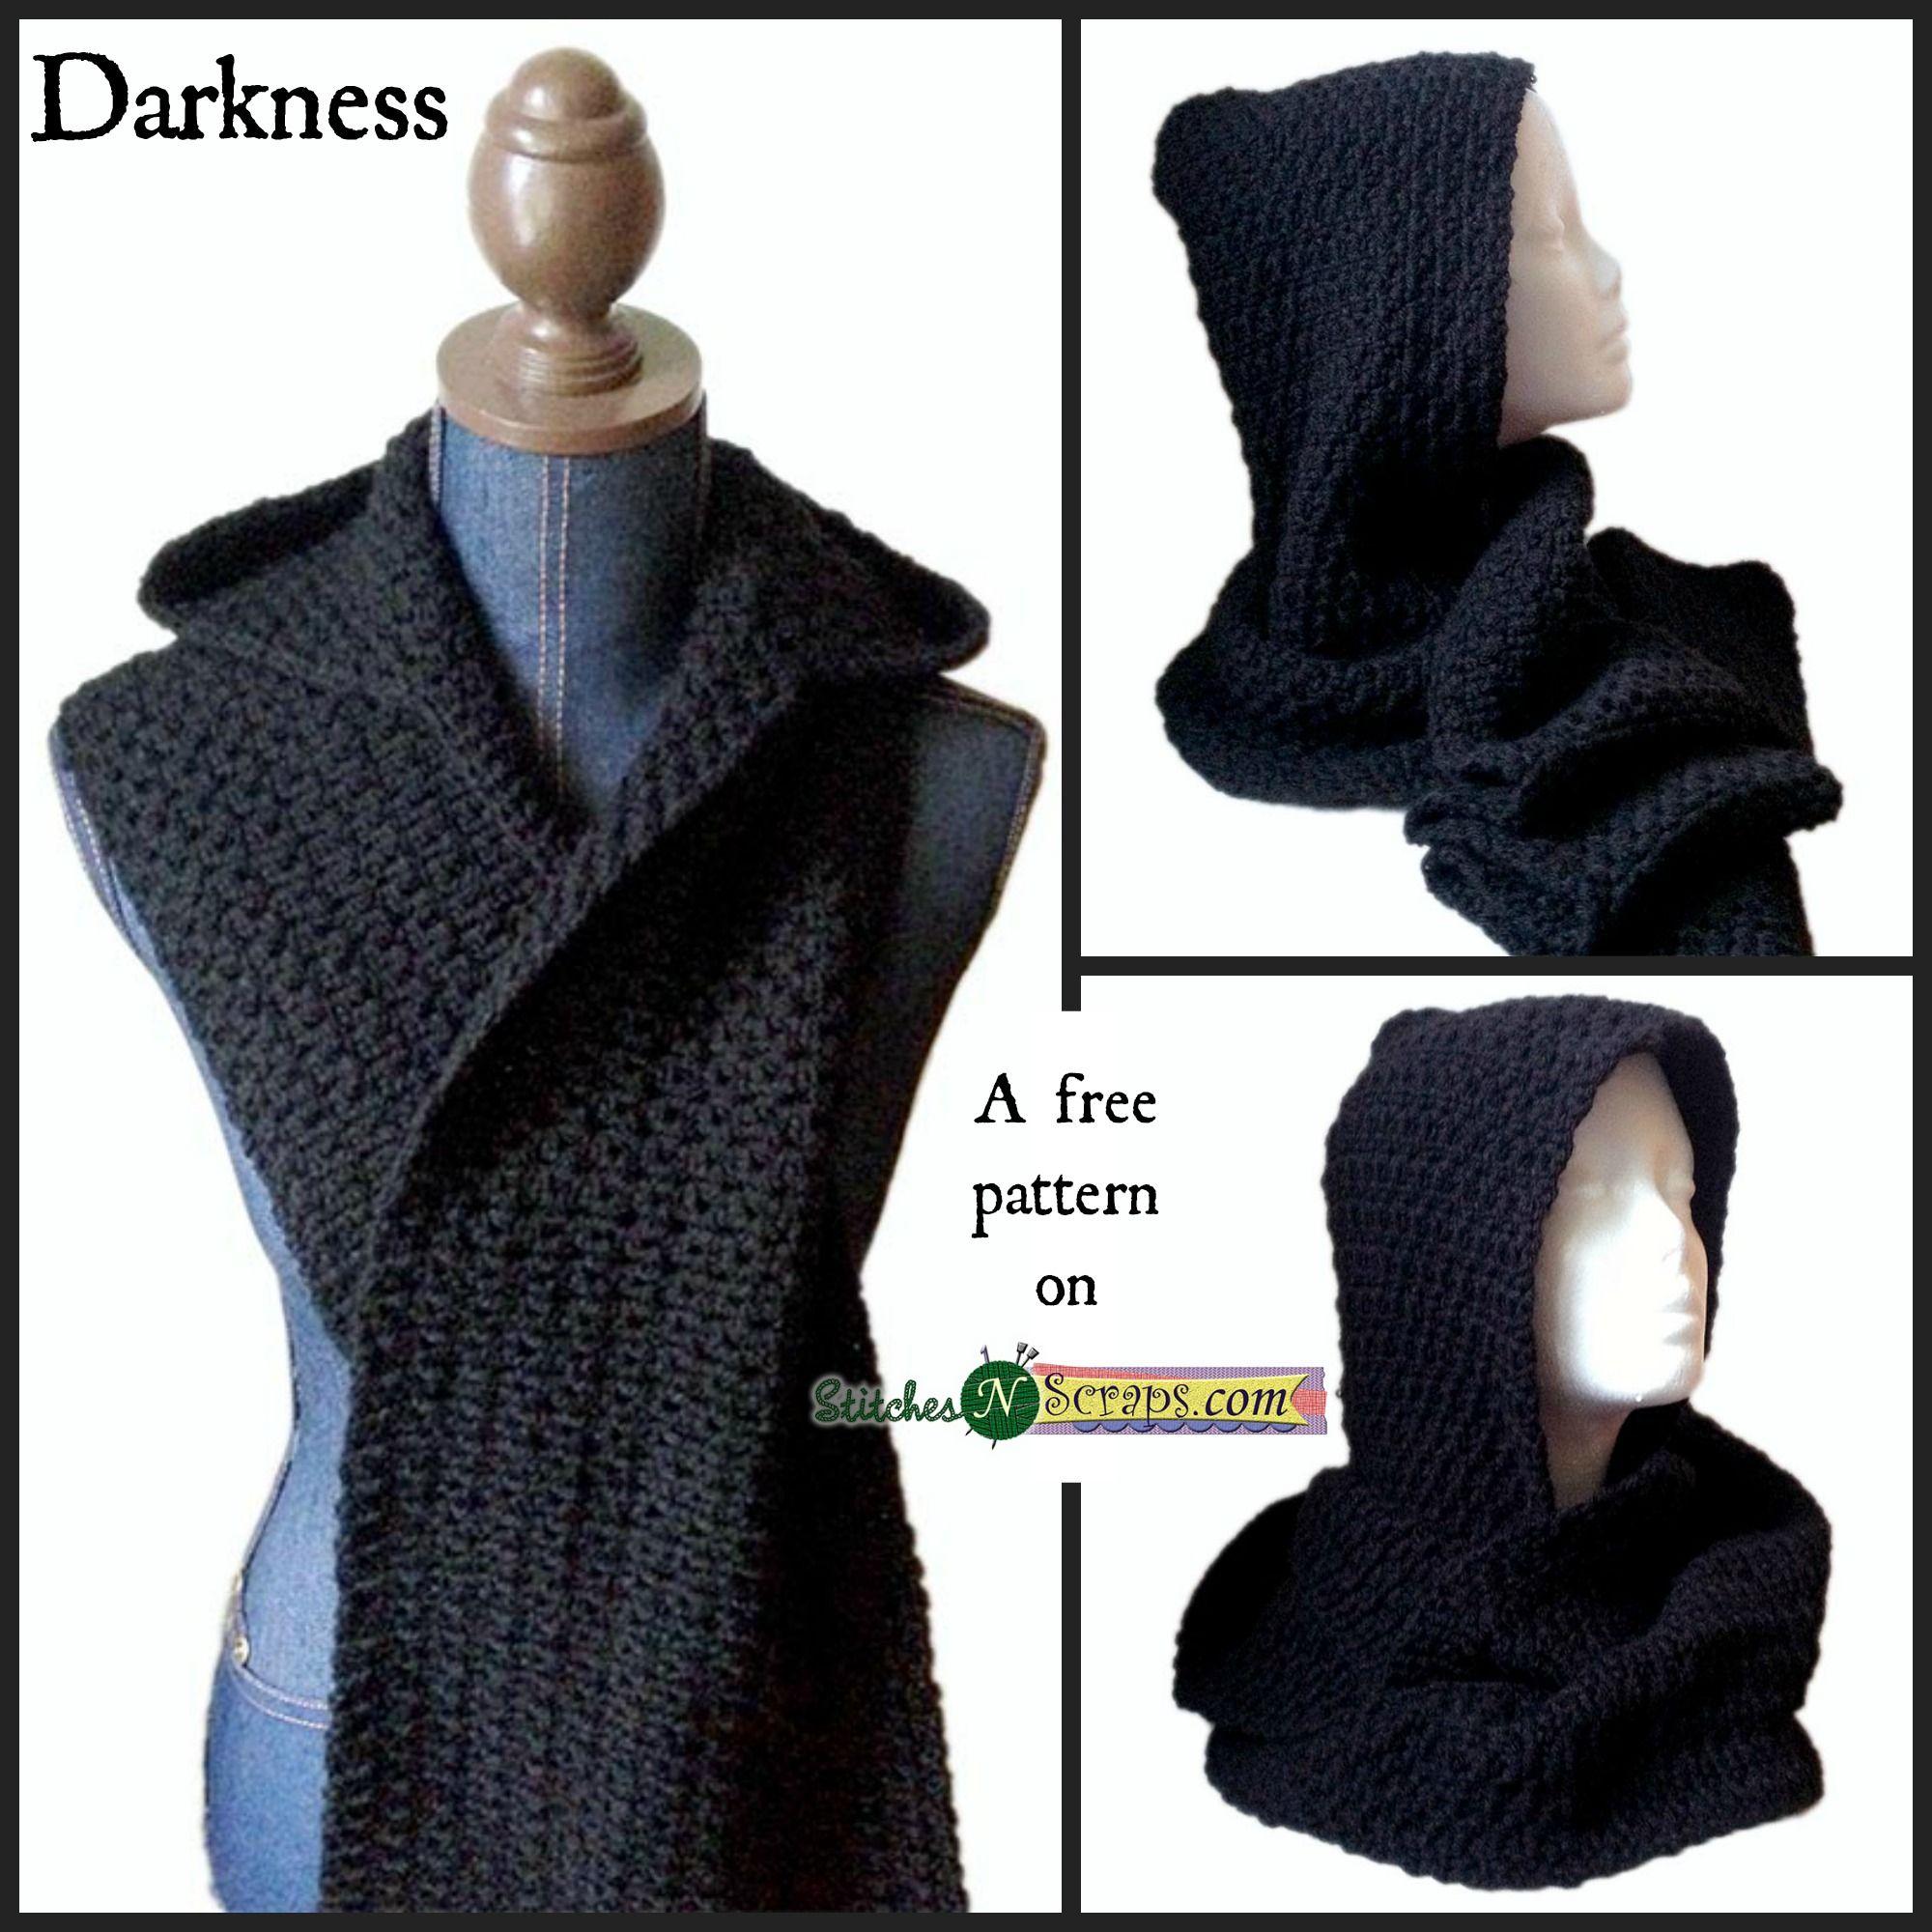 Darkness free crochet hooded scarf pattern by pia thadani at darkness free crochet hooded scarf pattern by pia thadani at stitches n scraps bankloansurffo Gallery